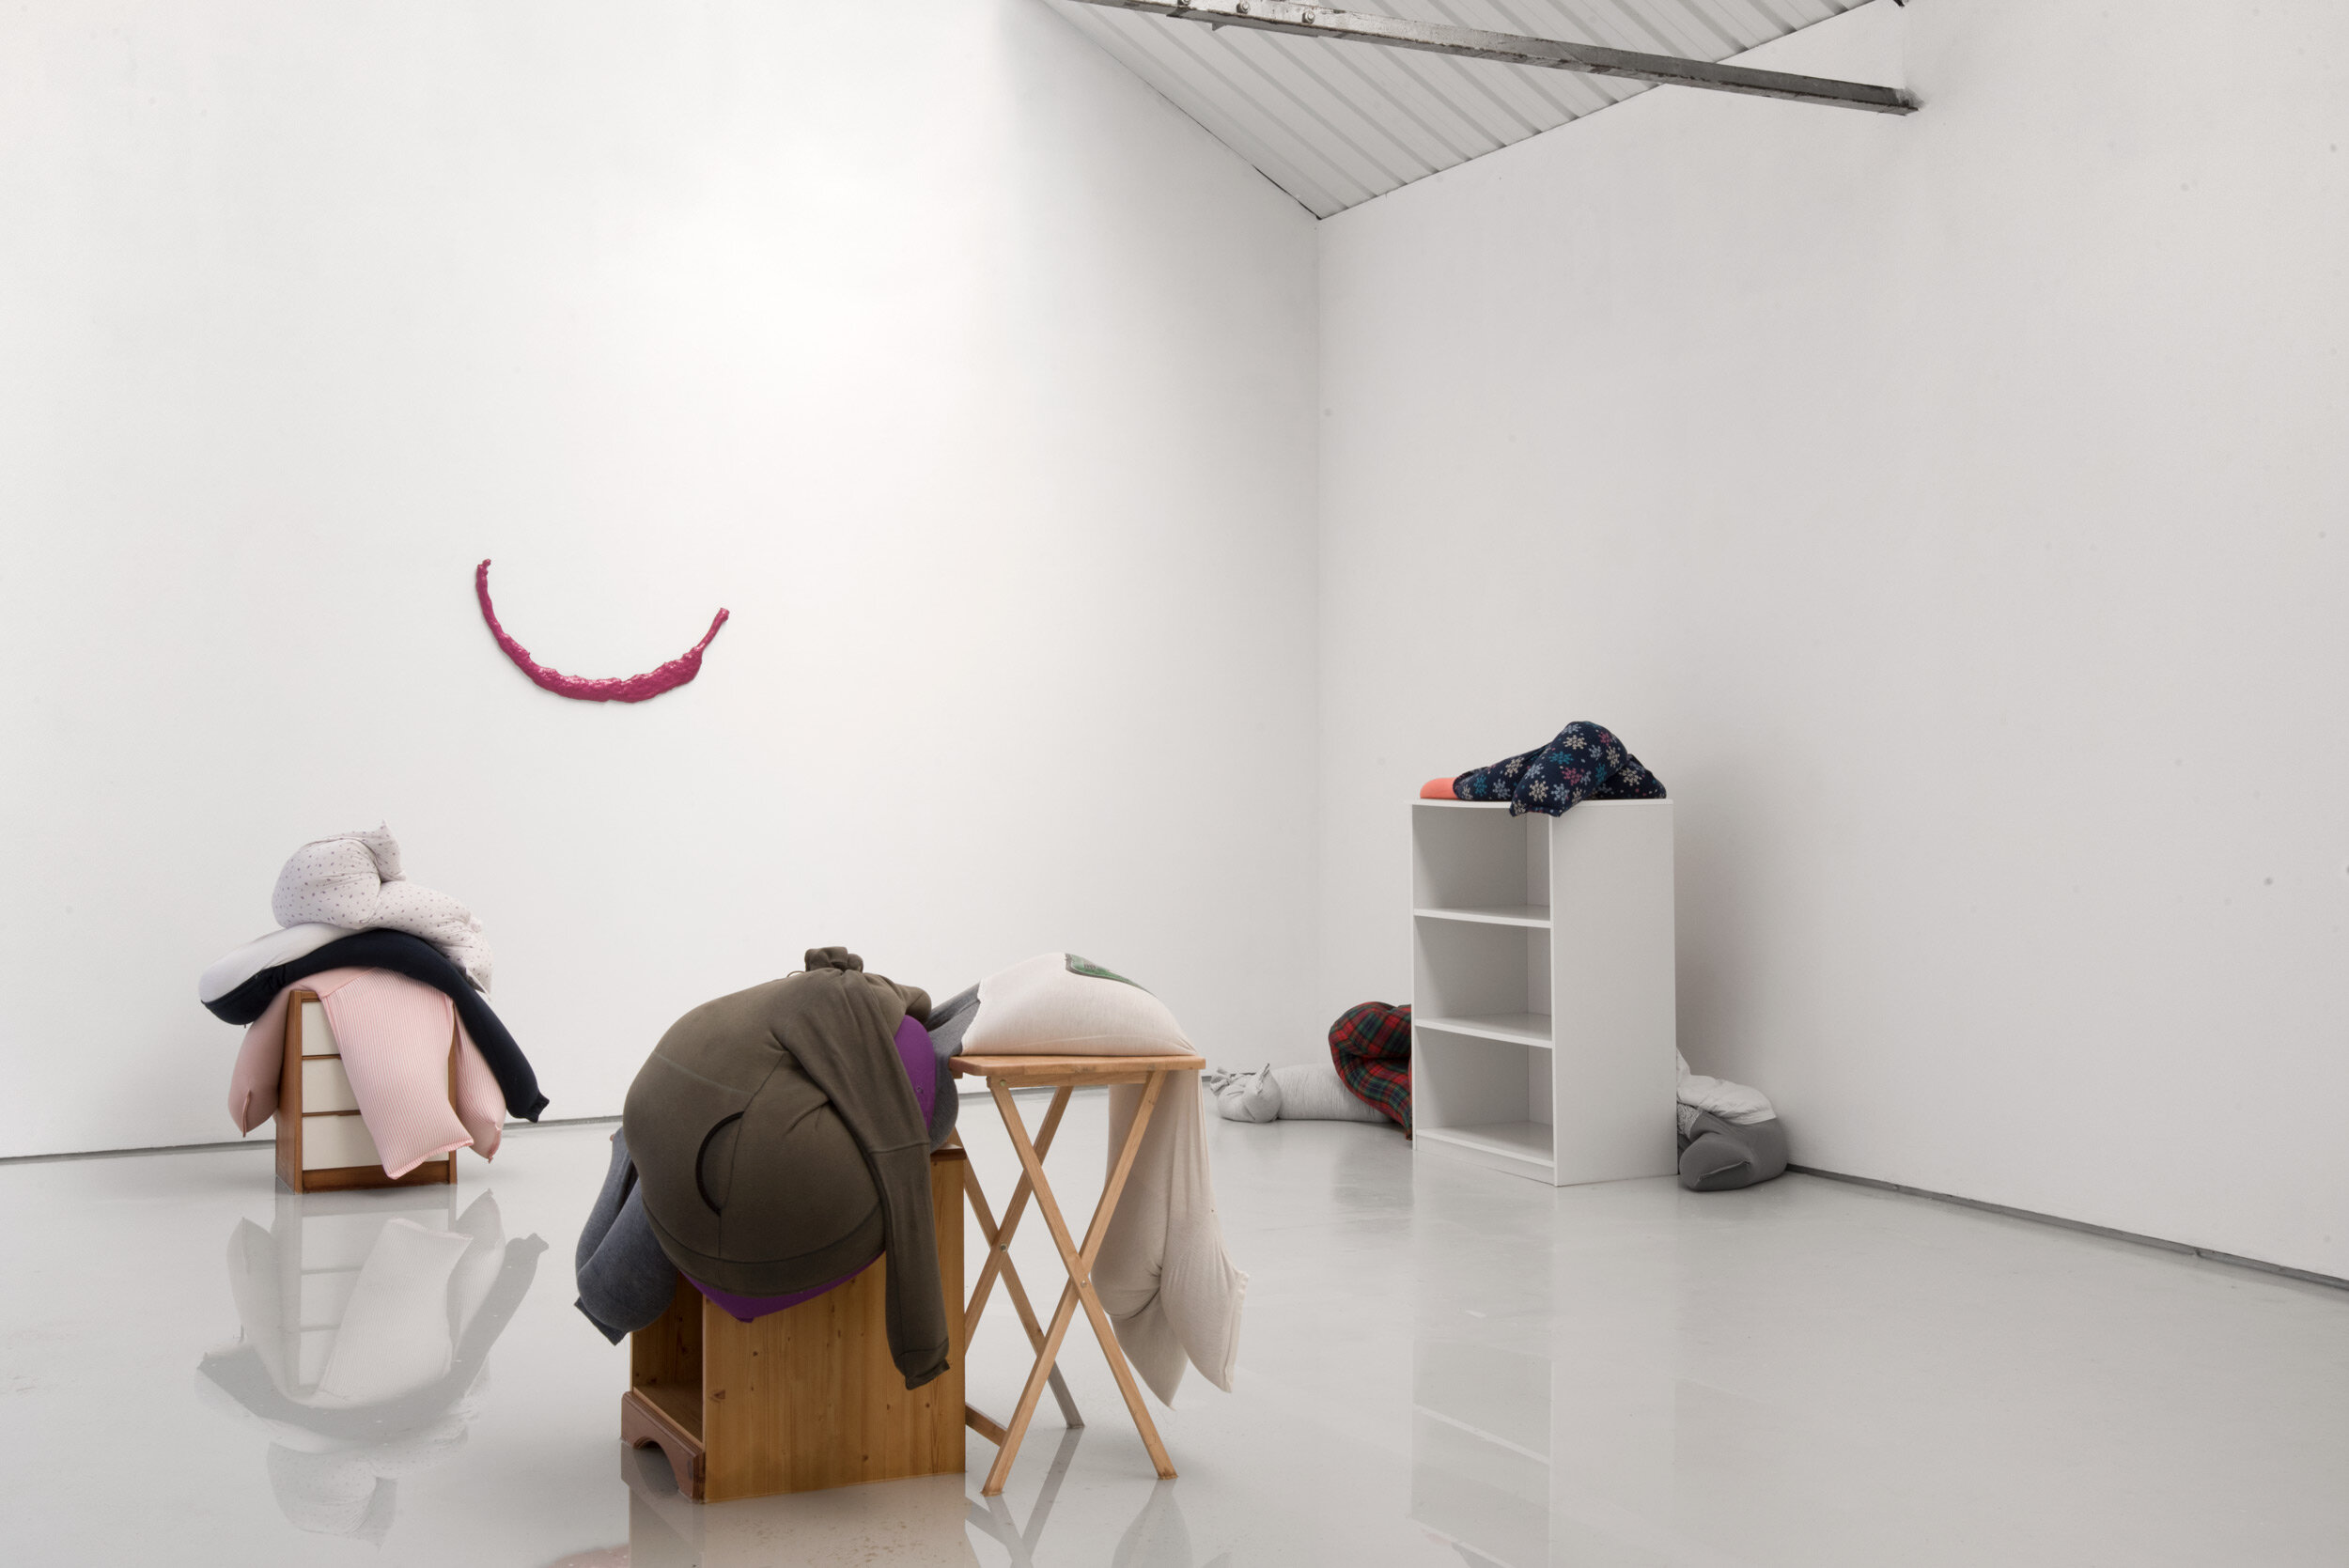 Fall, slump, drop on a bedside cabinet in water[...], Installation View, Alex Farrar, Bloc Projects, 2019, 1.jpg